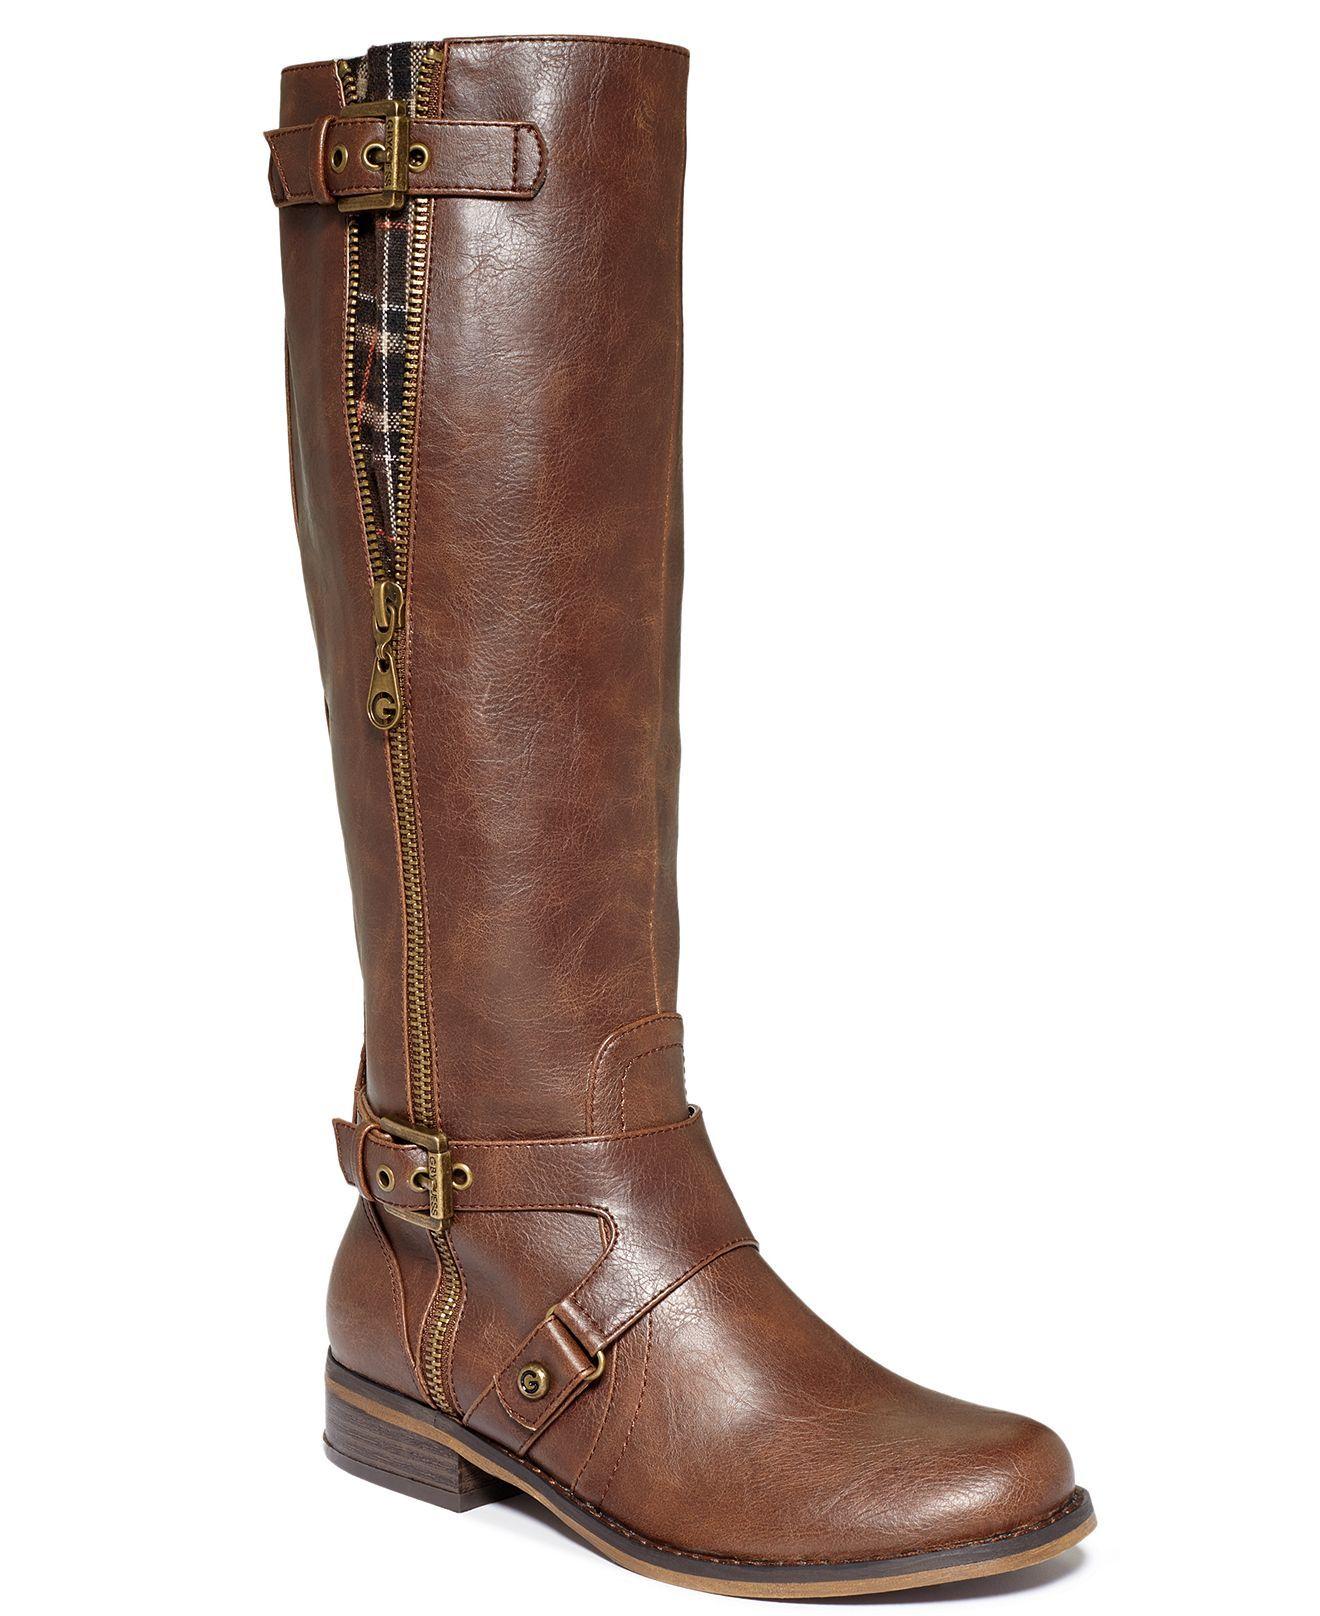 83e548b0e0e8f G by GUESS Women's Shoes, Hertlez Tall Shaft Wide Calf Riding Boots - Wide  Calf Boots - Shoes - Macy's